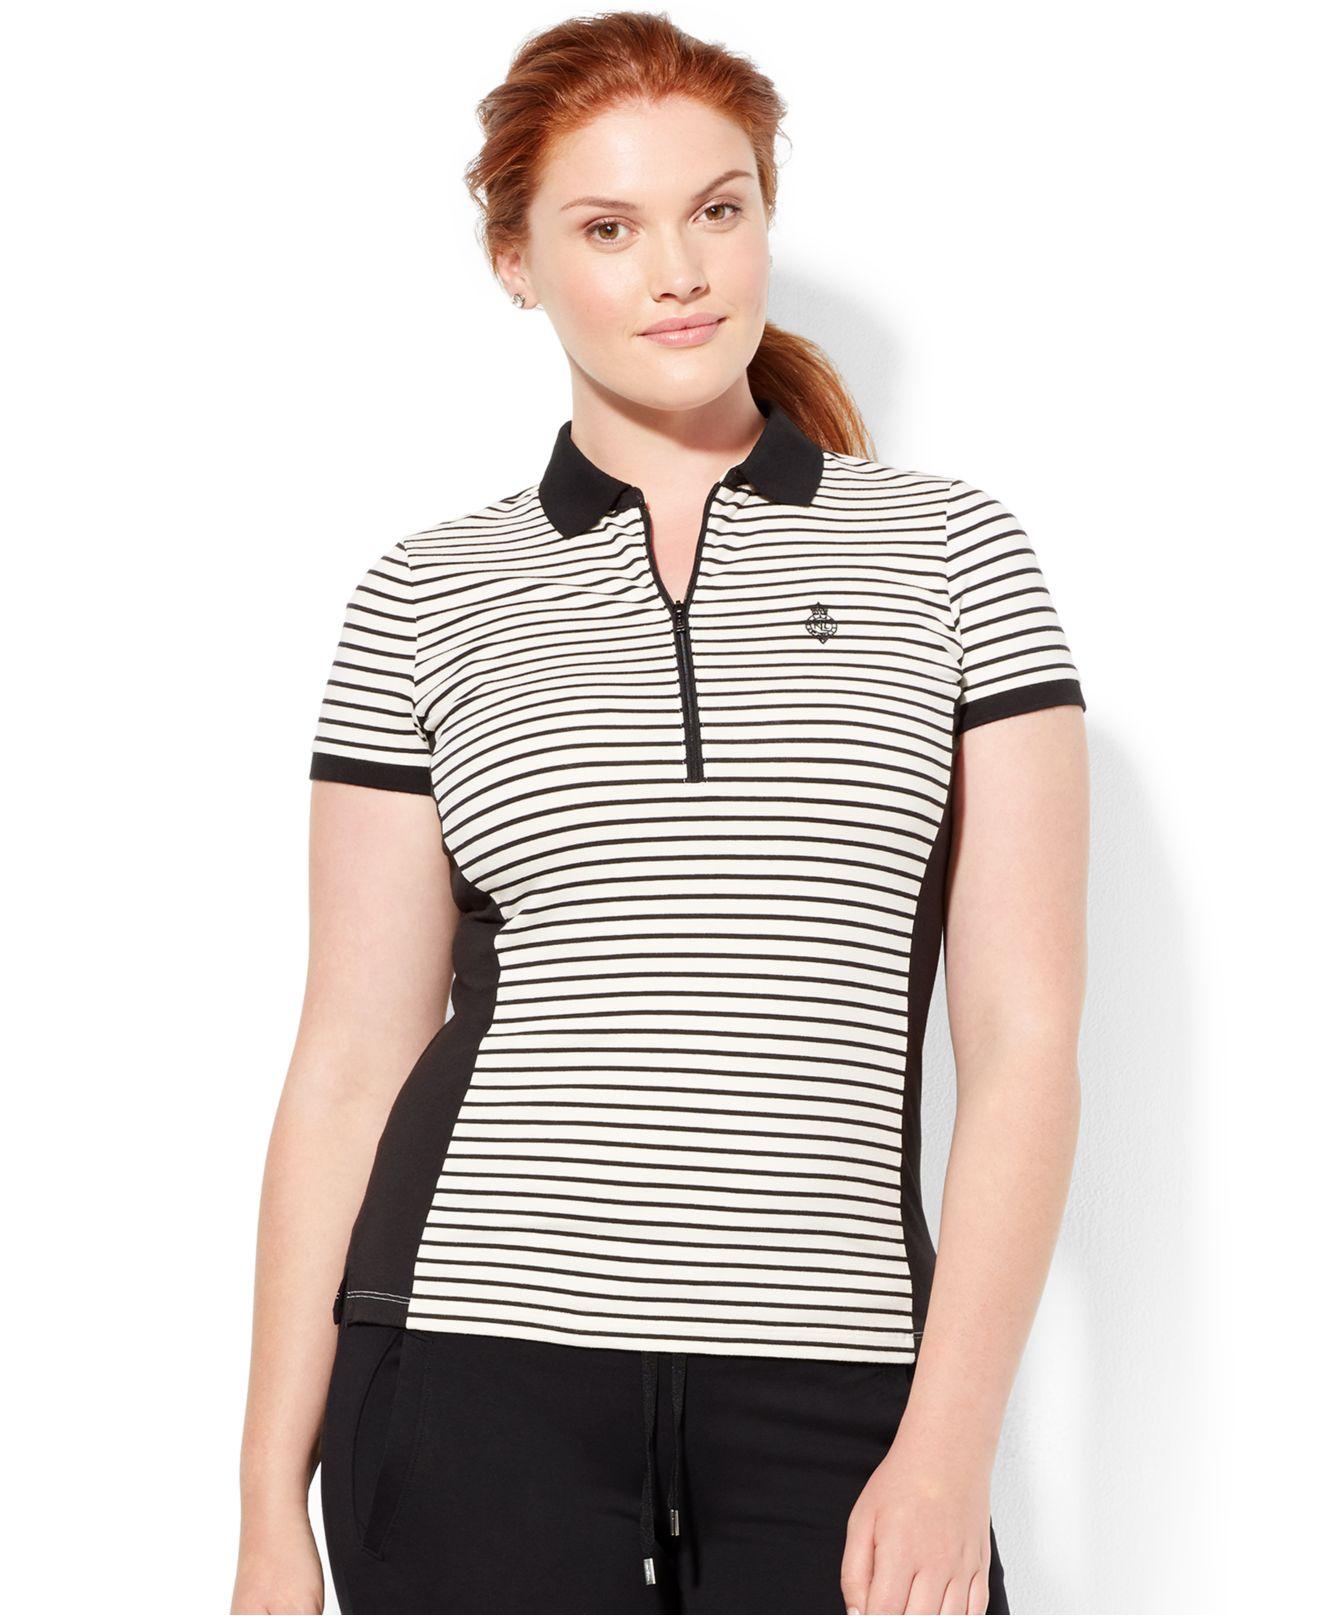 b52e5683892954 ... aliexpress lyst lauren by ralph lauren plus size striped half zip polo  shirt da699 2fef0